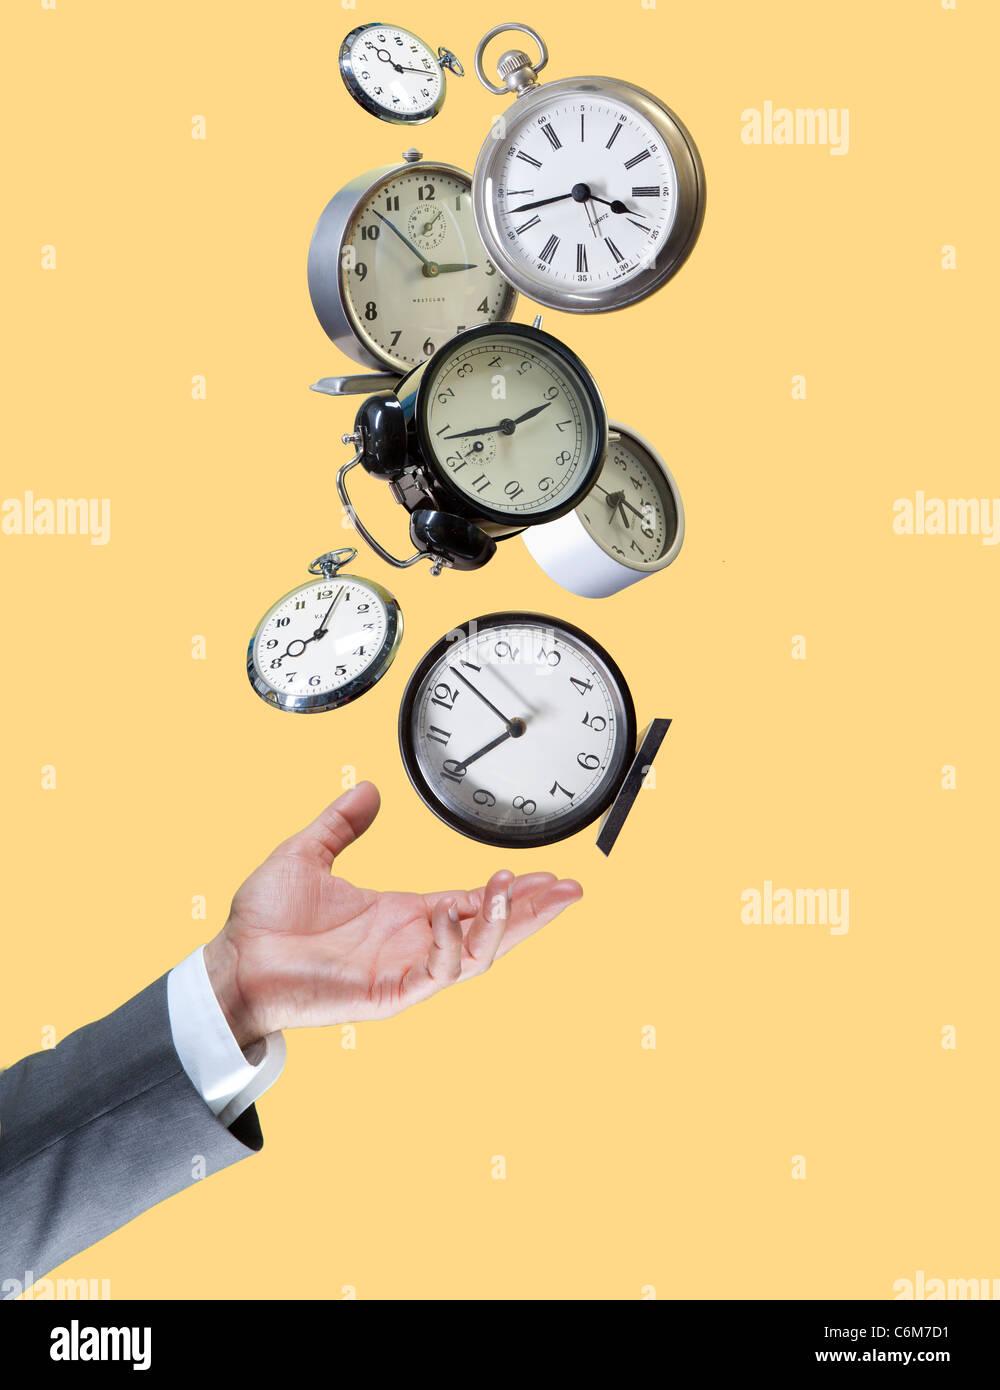 hand balances many clocks - Stock Image